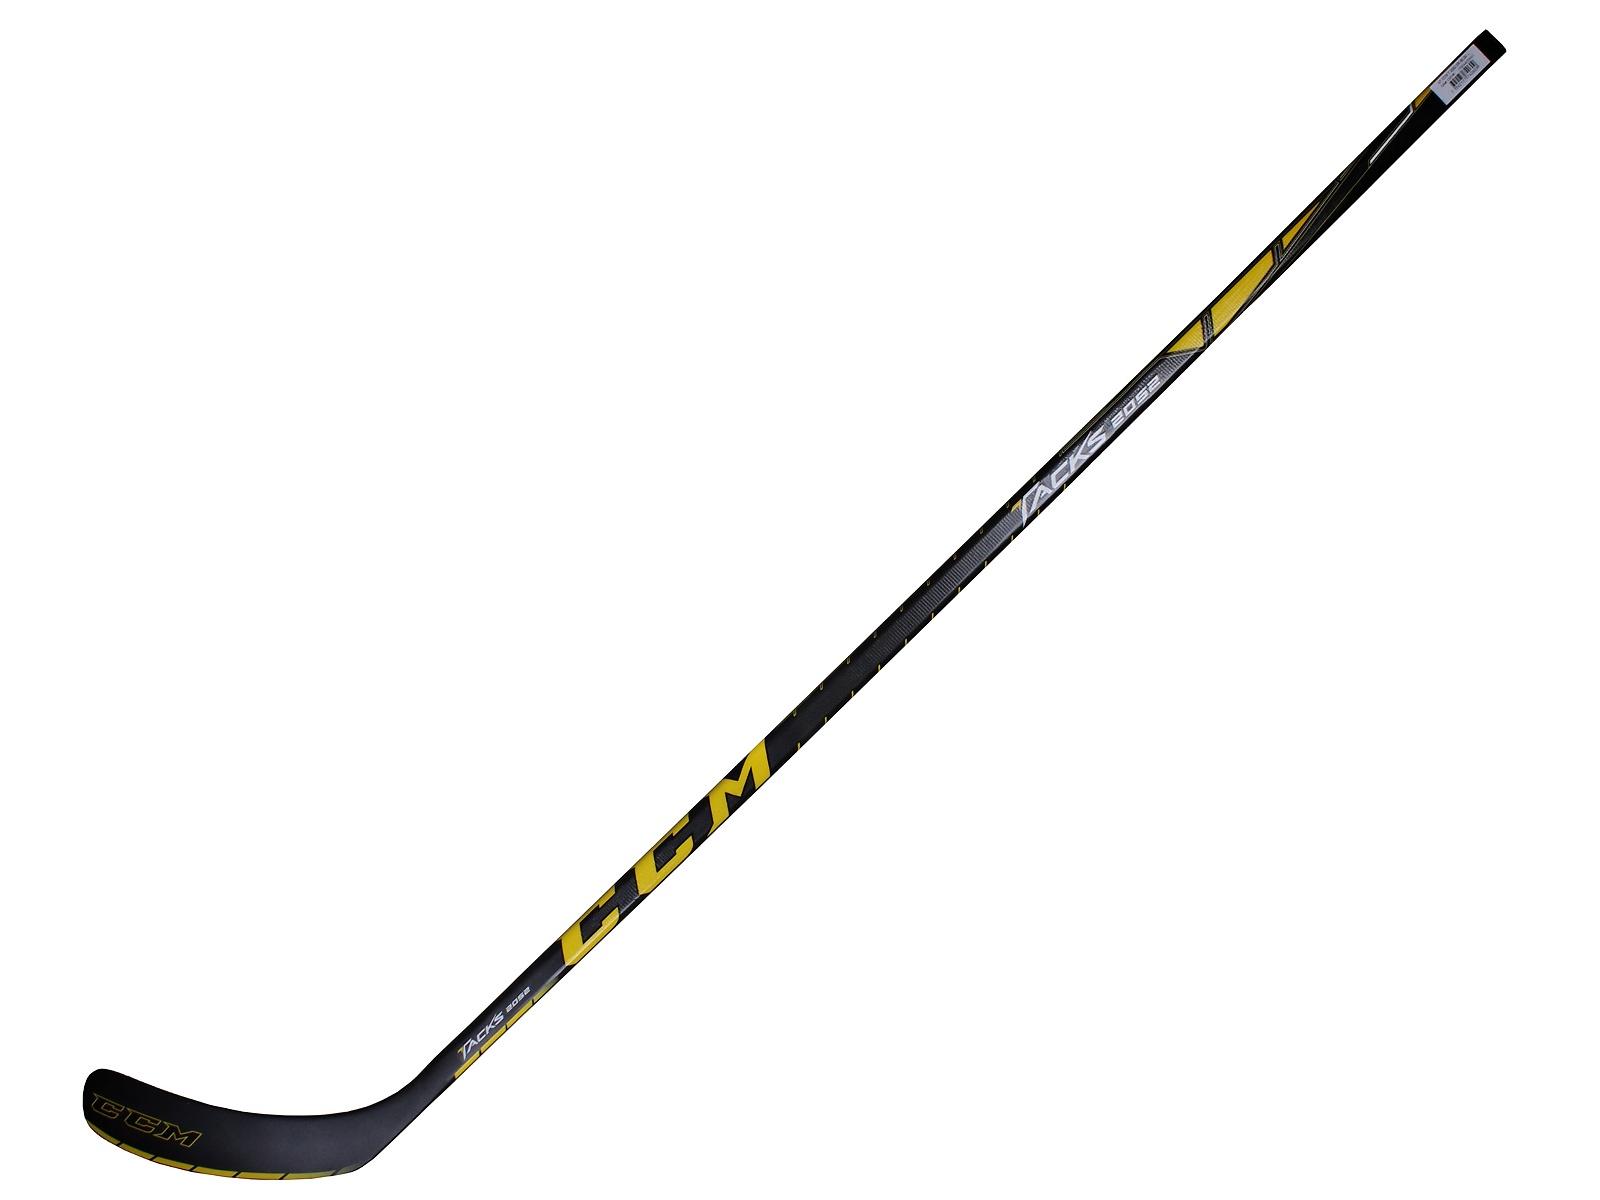 Hokejka CCM Tacks 2052 G kompozit, flex 85 - LH 29